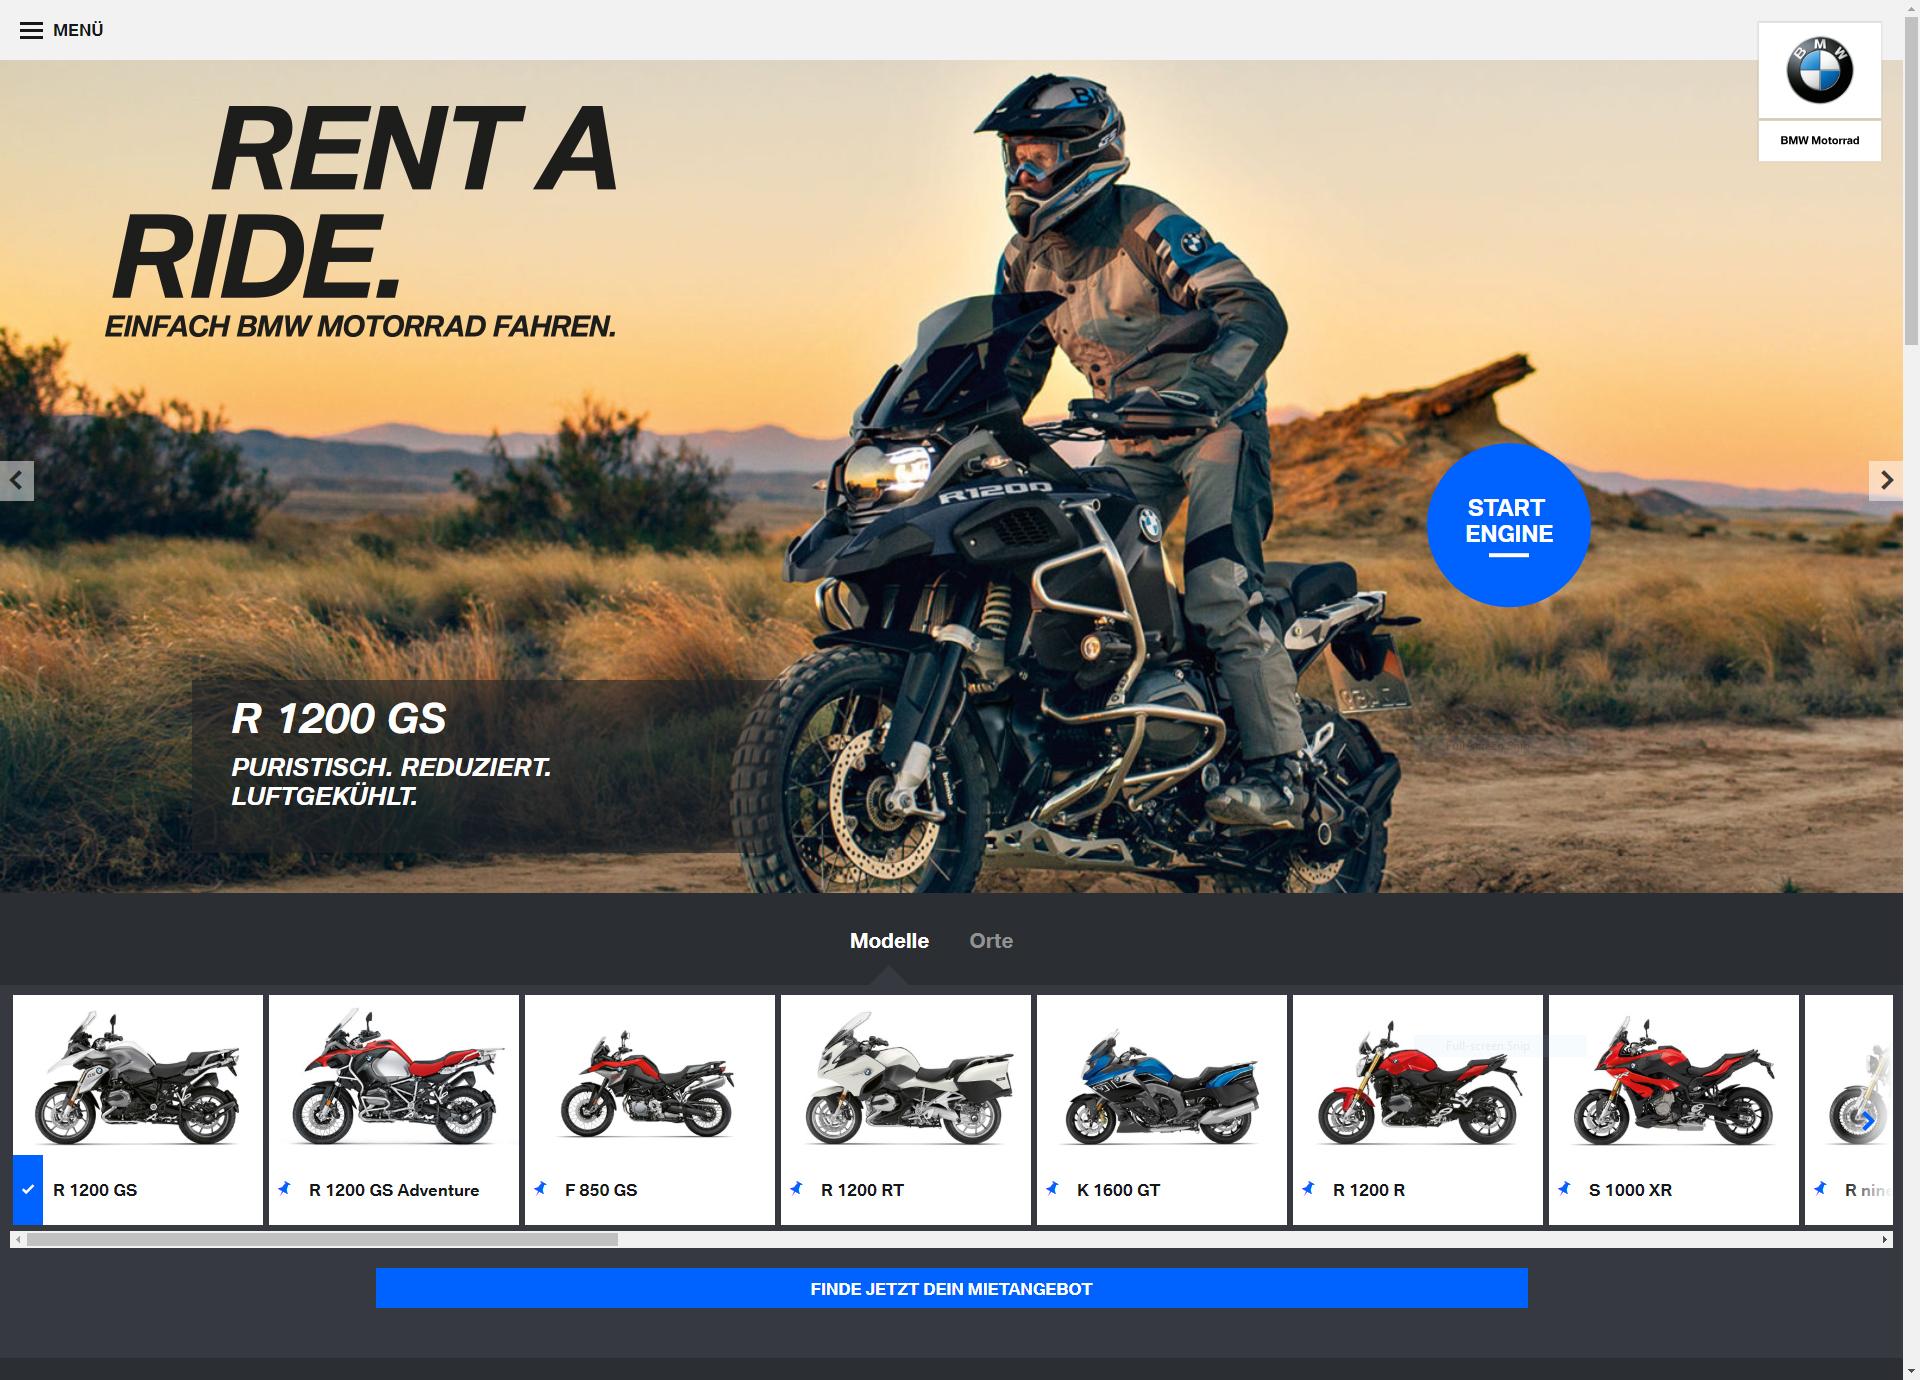 aaP90321731_highRes_bmw-motorrad-rent-a-